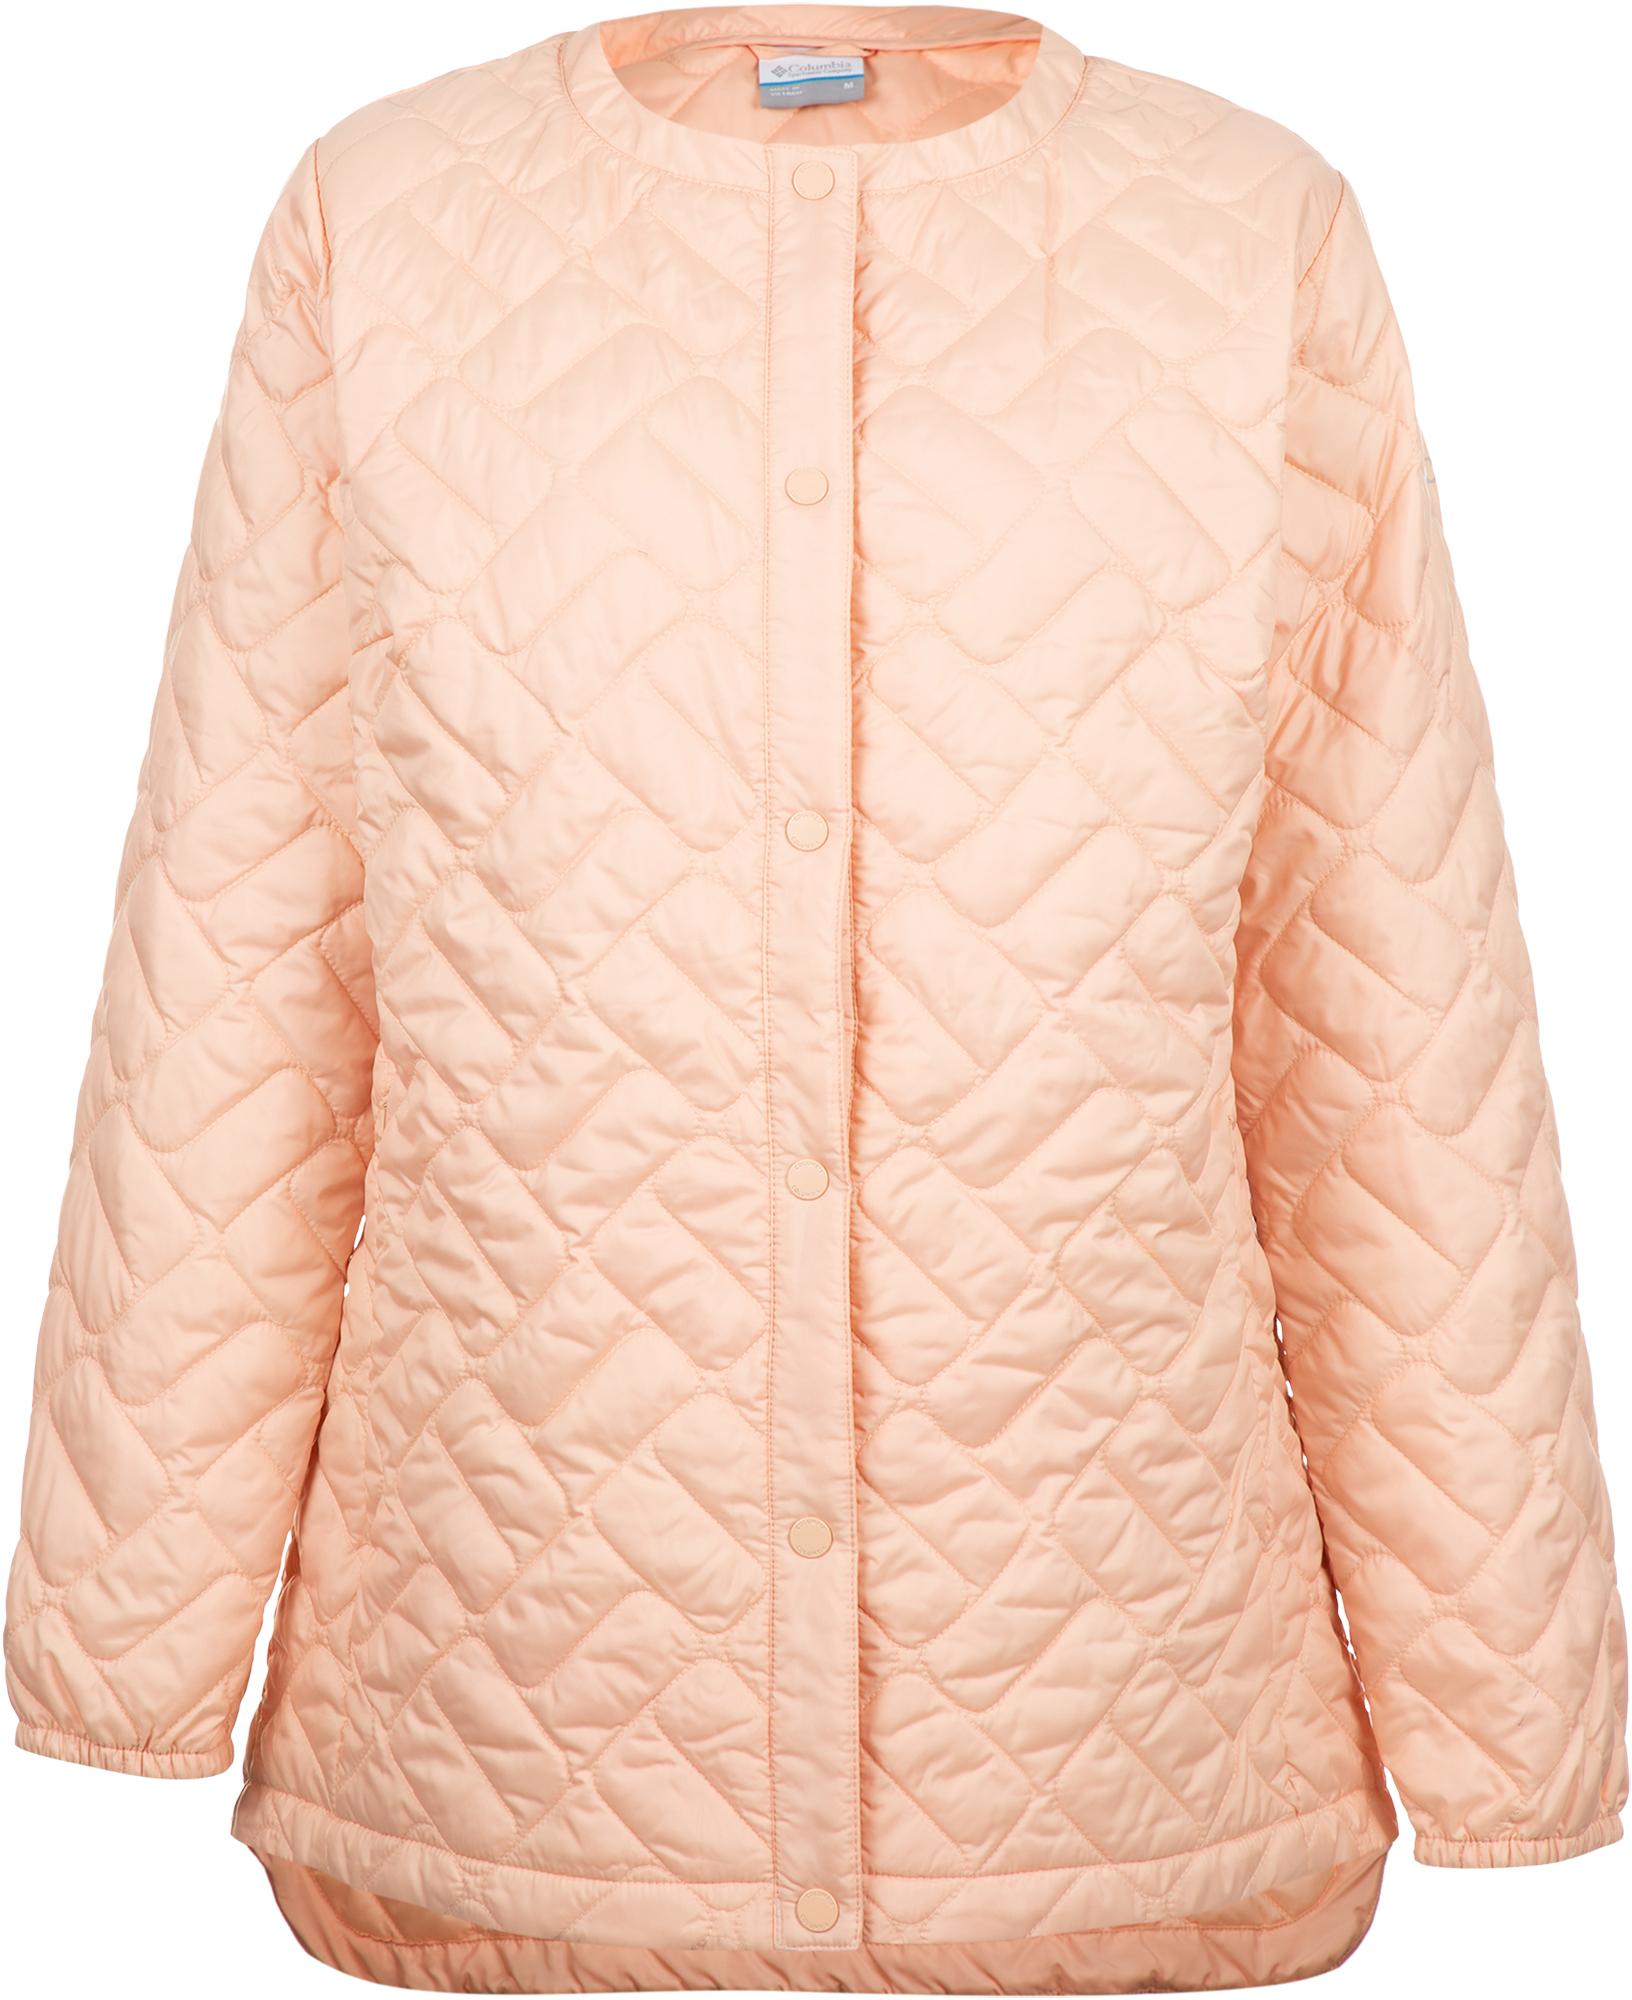 Columbia Куртка утепленная женская Columbia Sweet View, размер 46 цена и фото